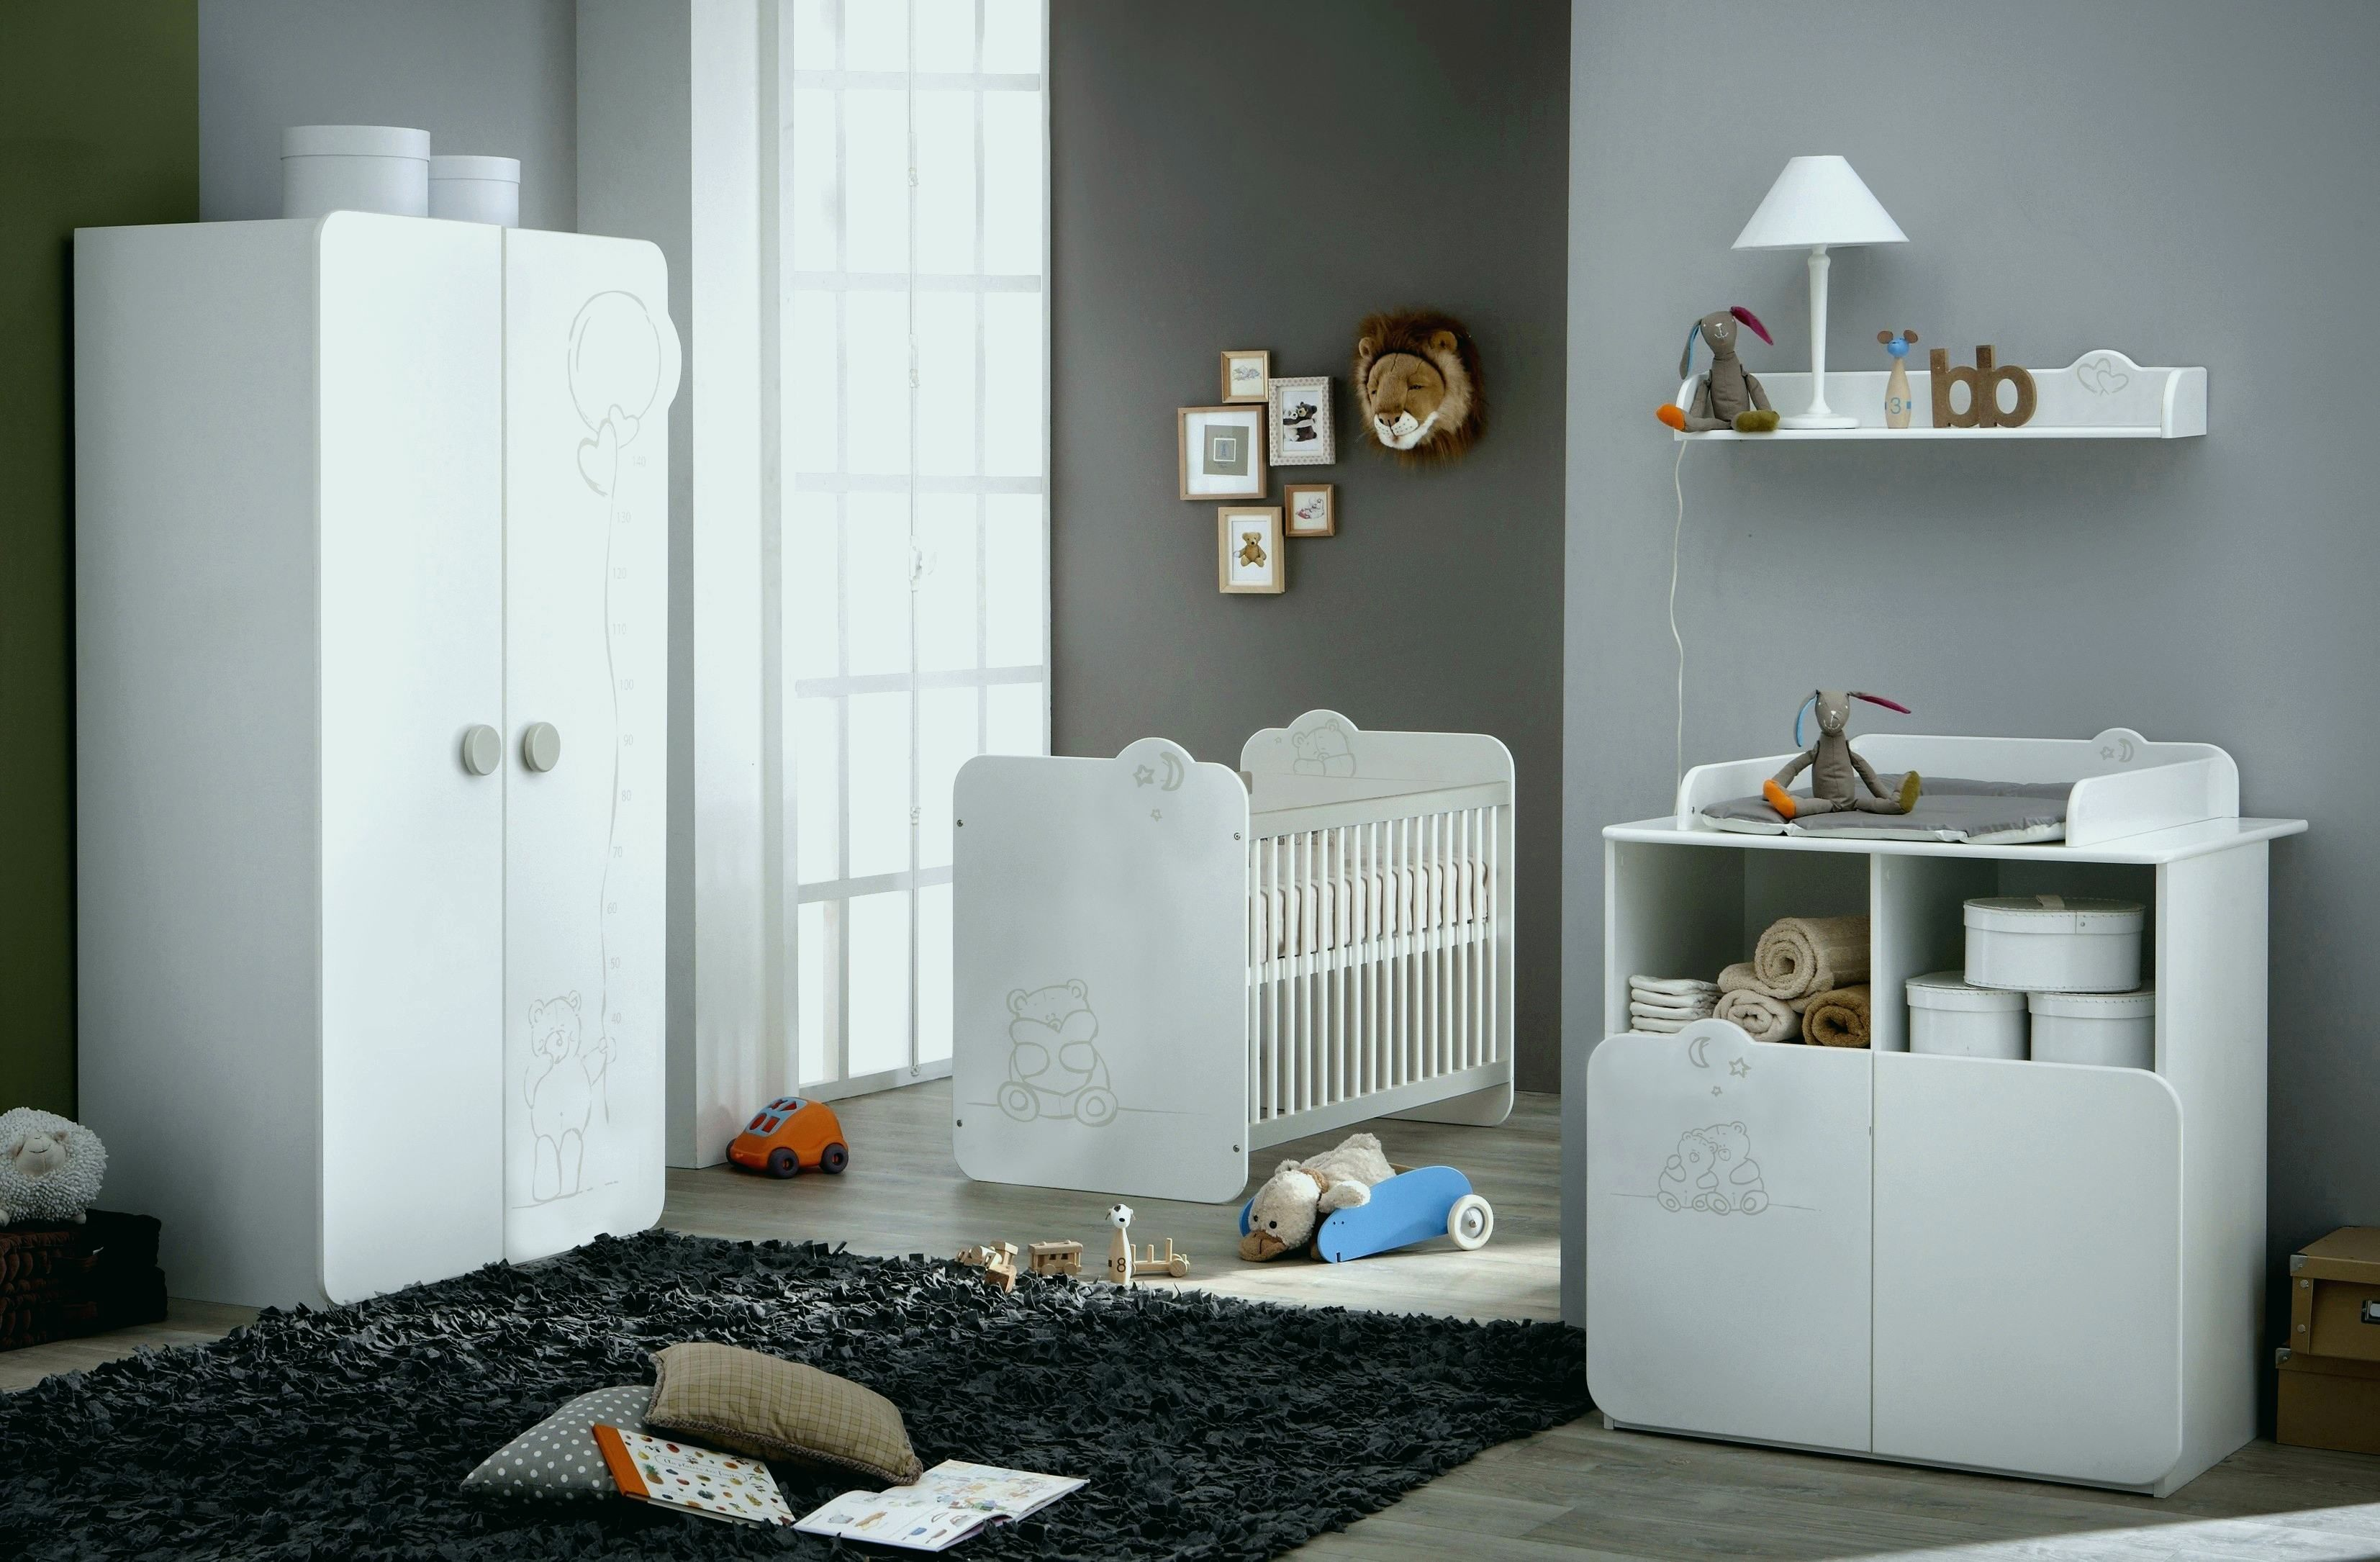 lit cabane montessori pas cher fra che stylish lit cabane. Black Bedroom Furniture Sets. Home Design Ideas